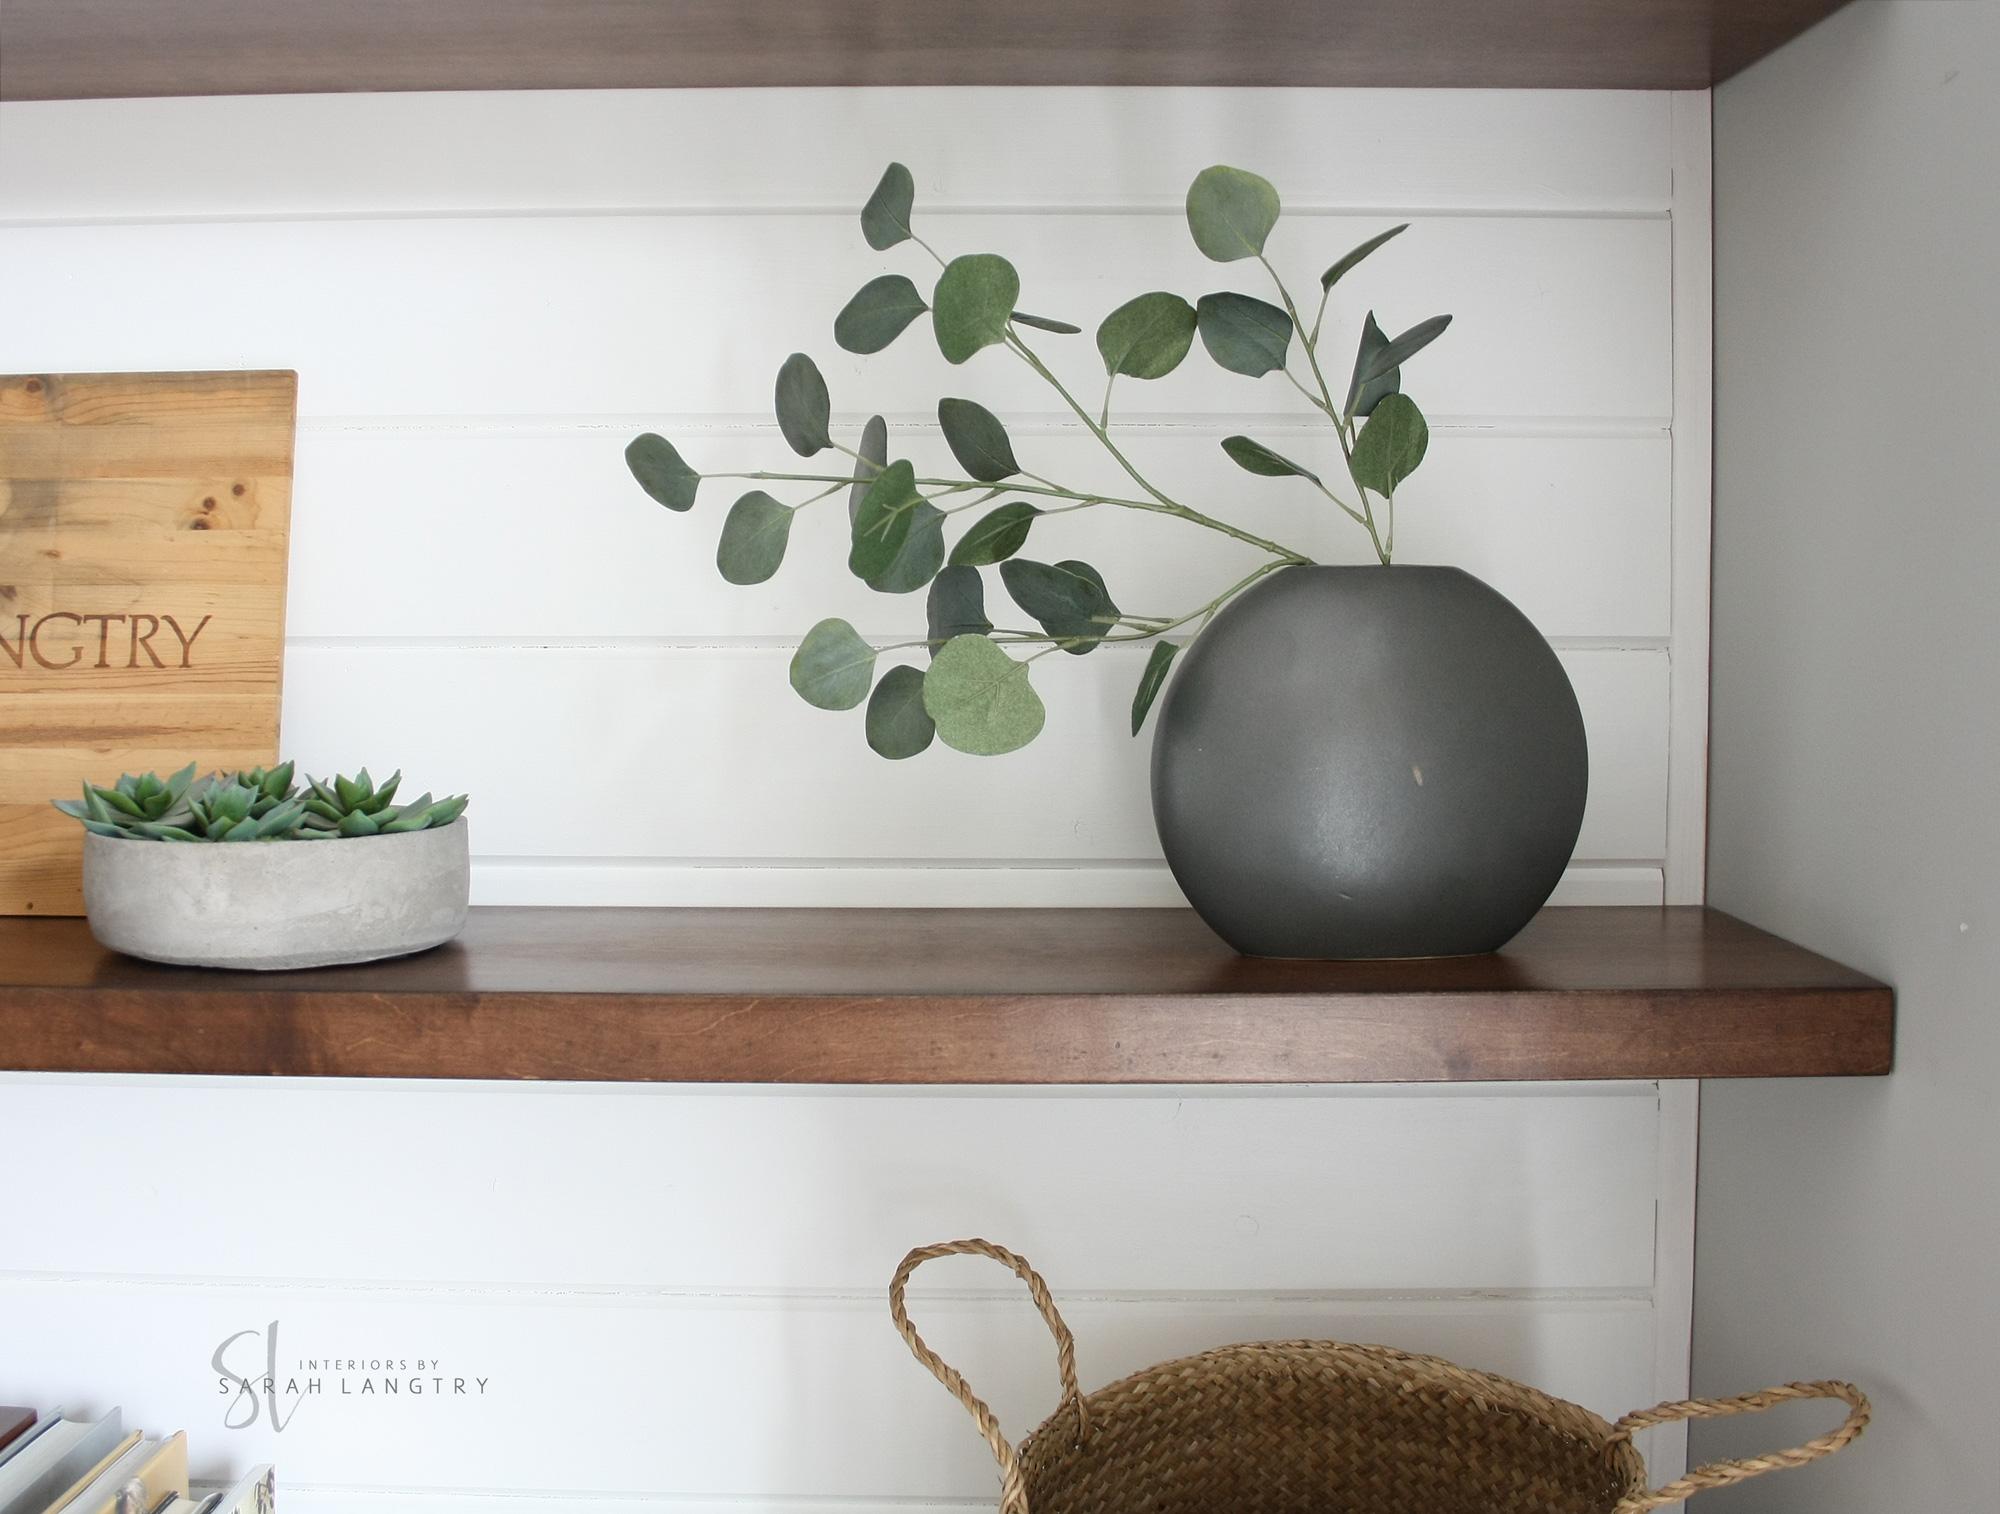 interior-design-styling-furniture-goderich-ontario_edited-1.jpg